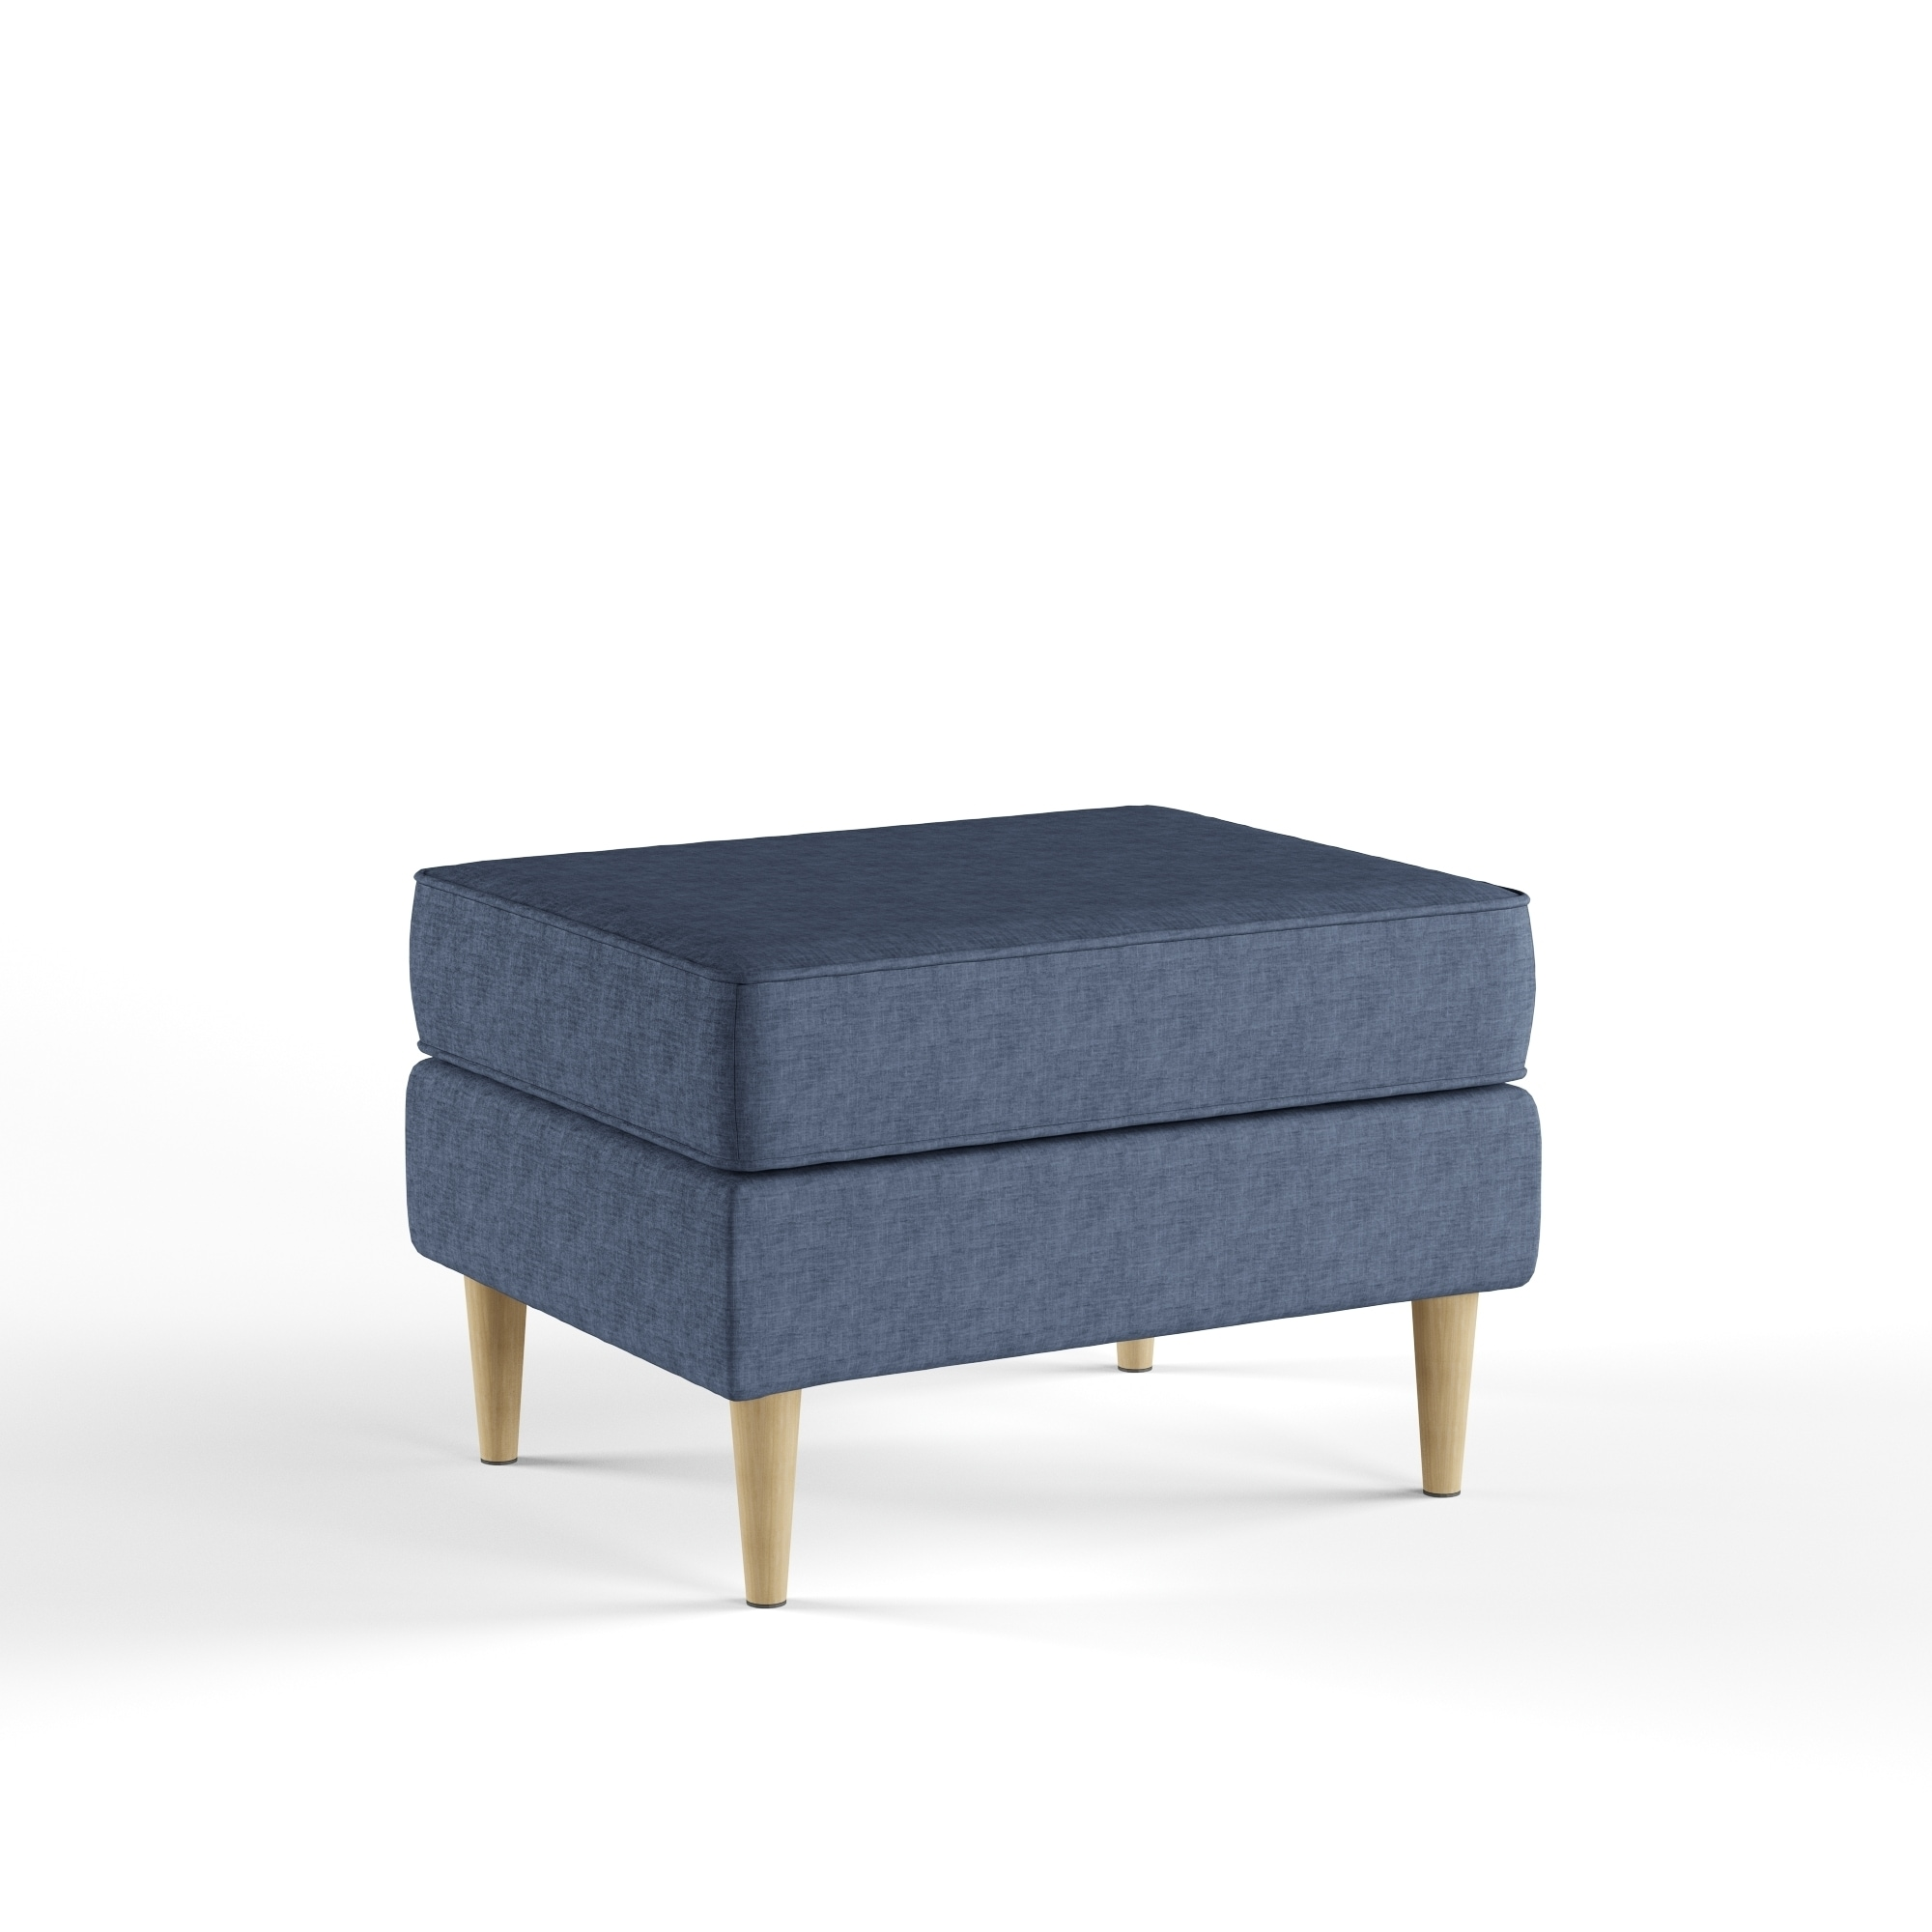 Excellent Carson Carrington Larvik Mid Century Modern Fabric Ottoman Unemploymentrelief Wooden Chair Designs For Living Room Unemploymentrelieforg